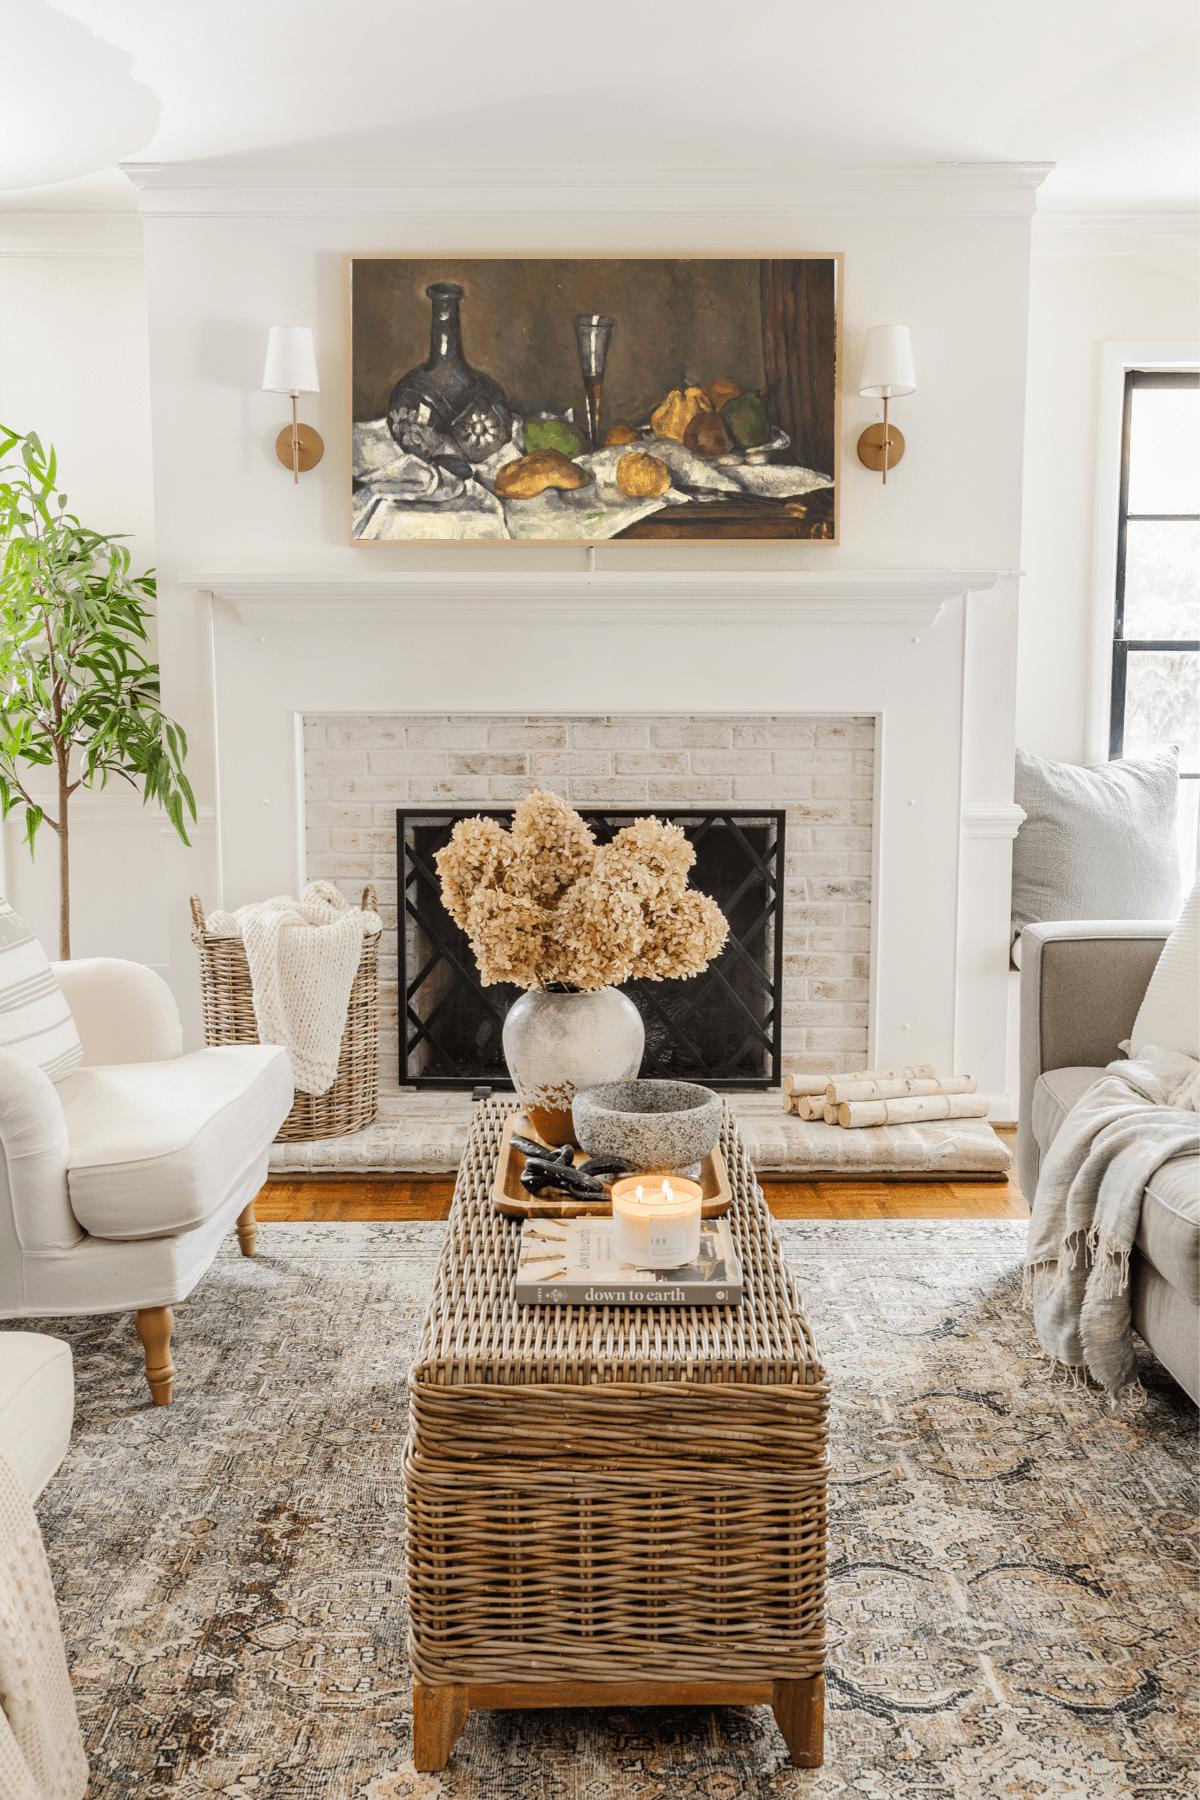 Samsung Frame TV in living room with still life art